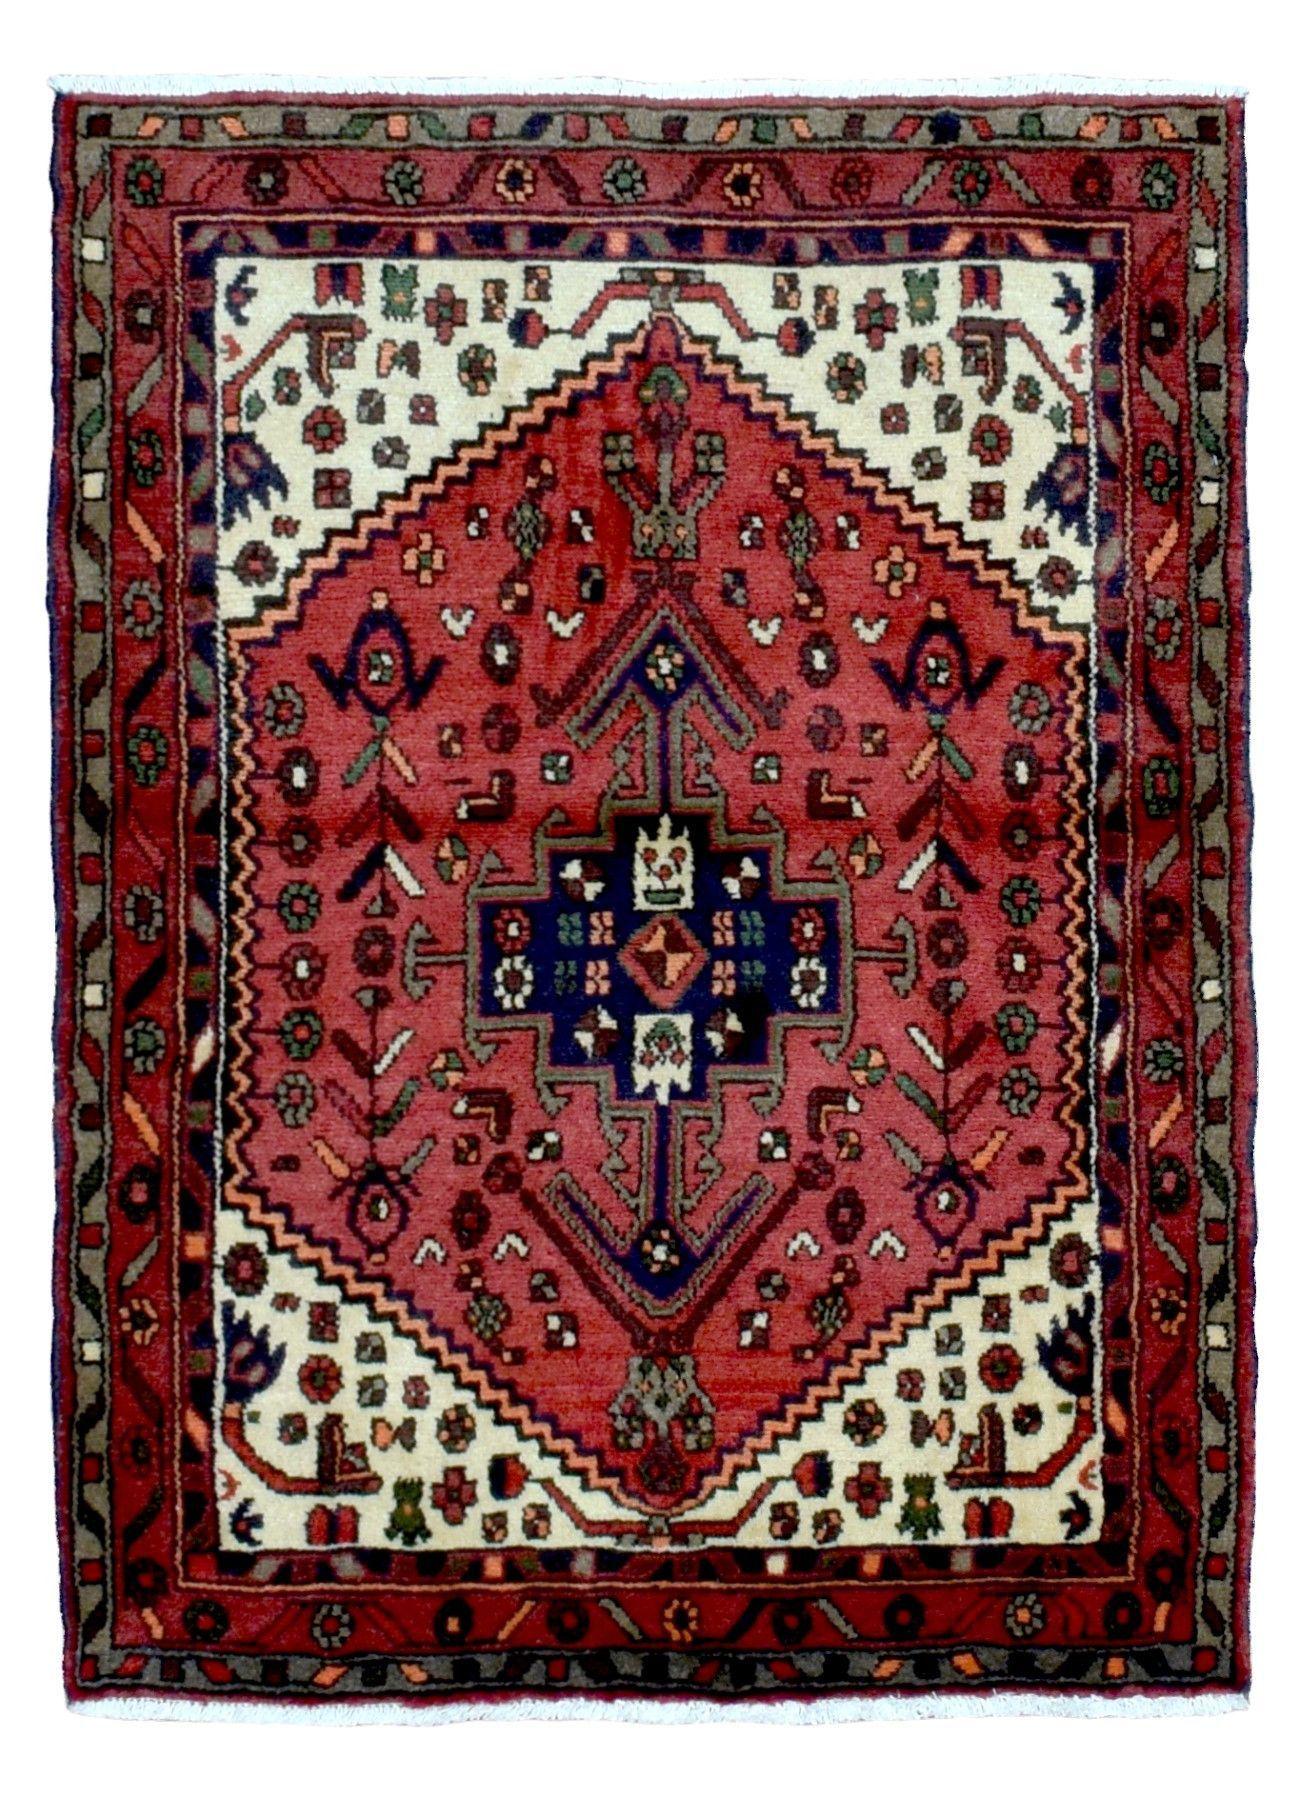 Semi-Antique Red and Beige Persian Hamadan Oriental Rug 3'4X4'6